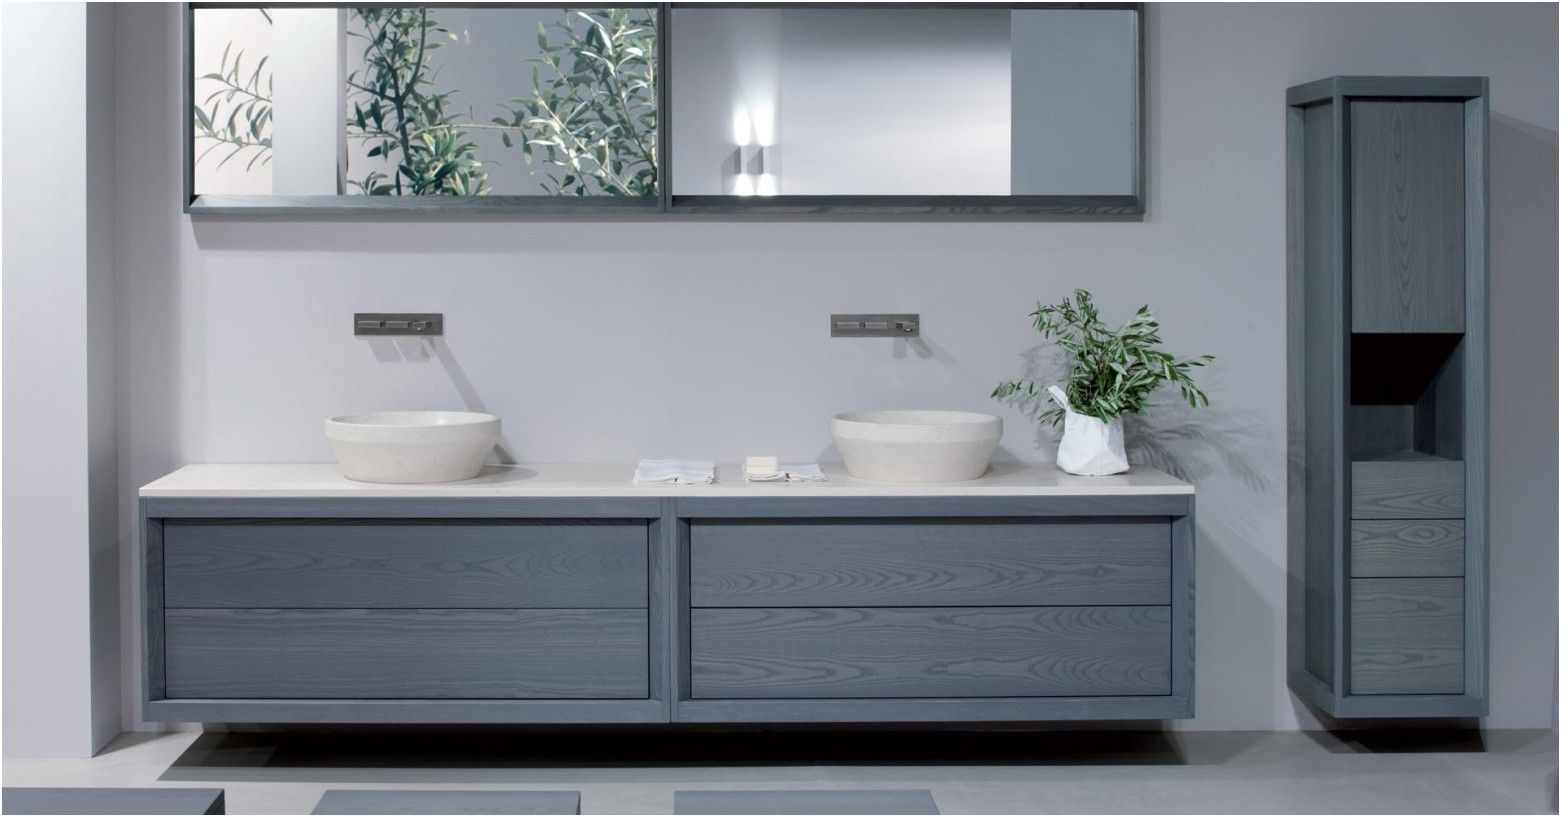 26+ Bathroom cabinets double vanity type